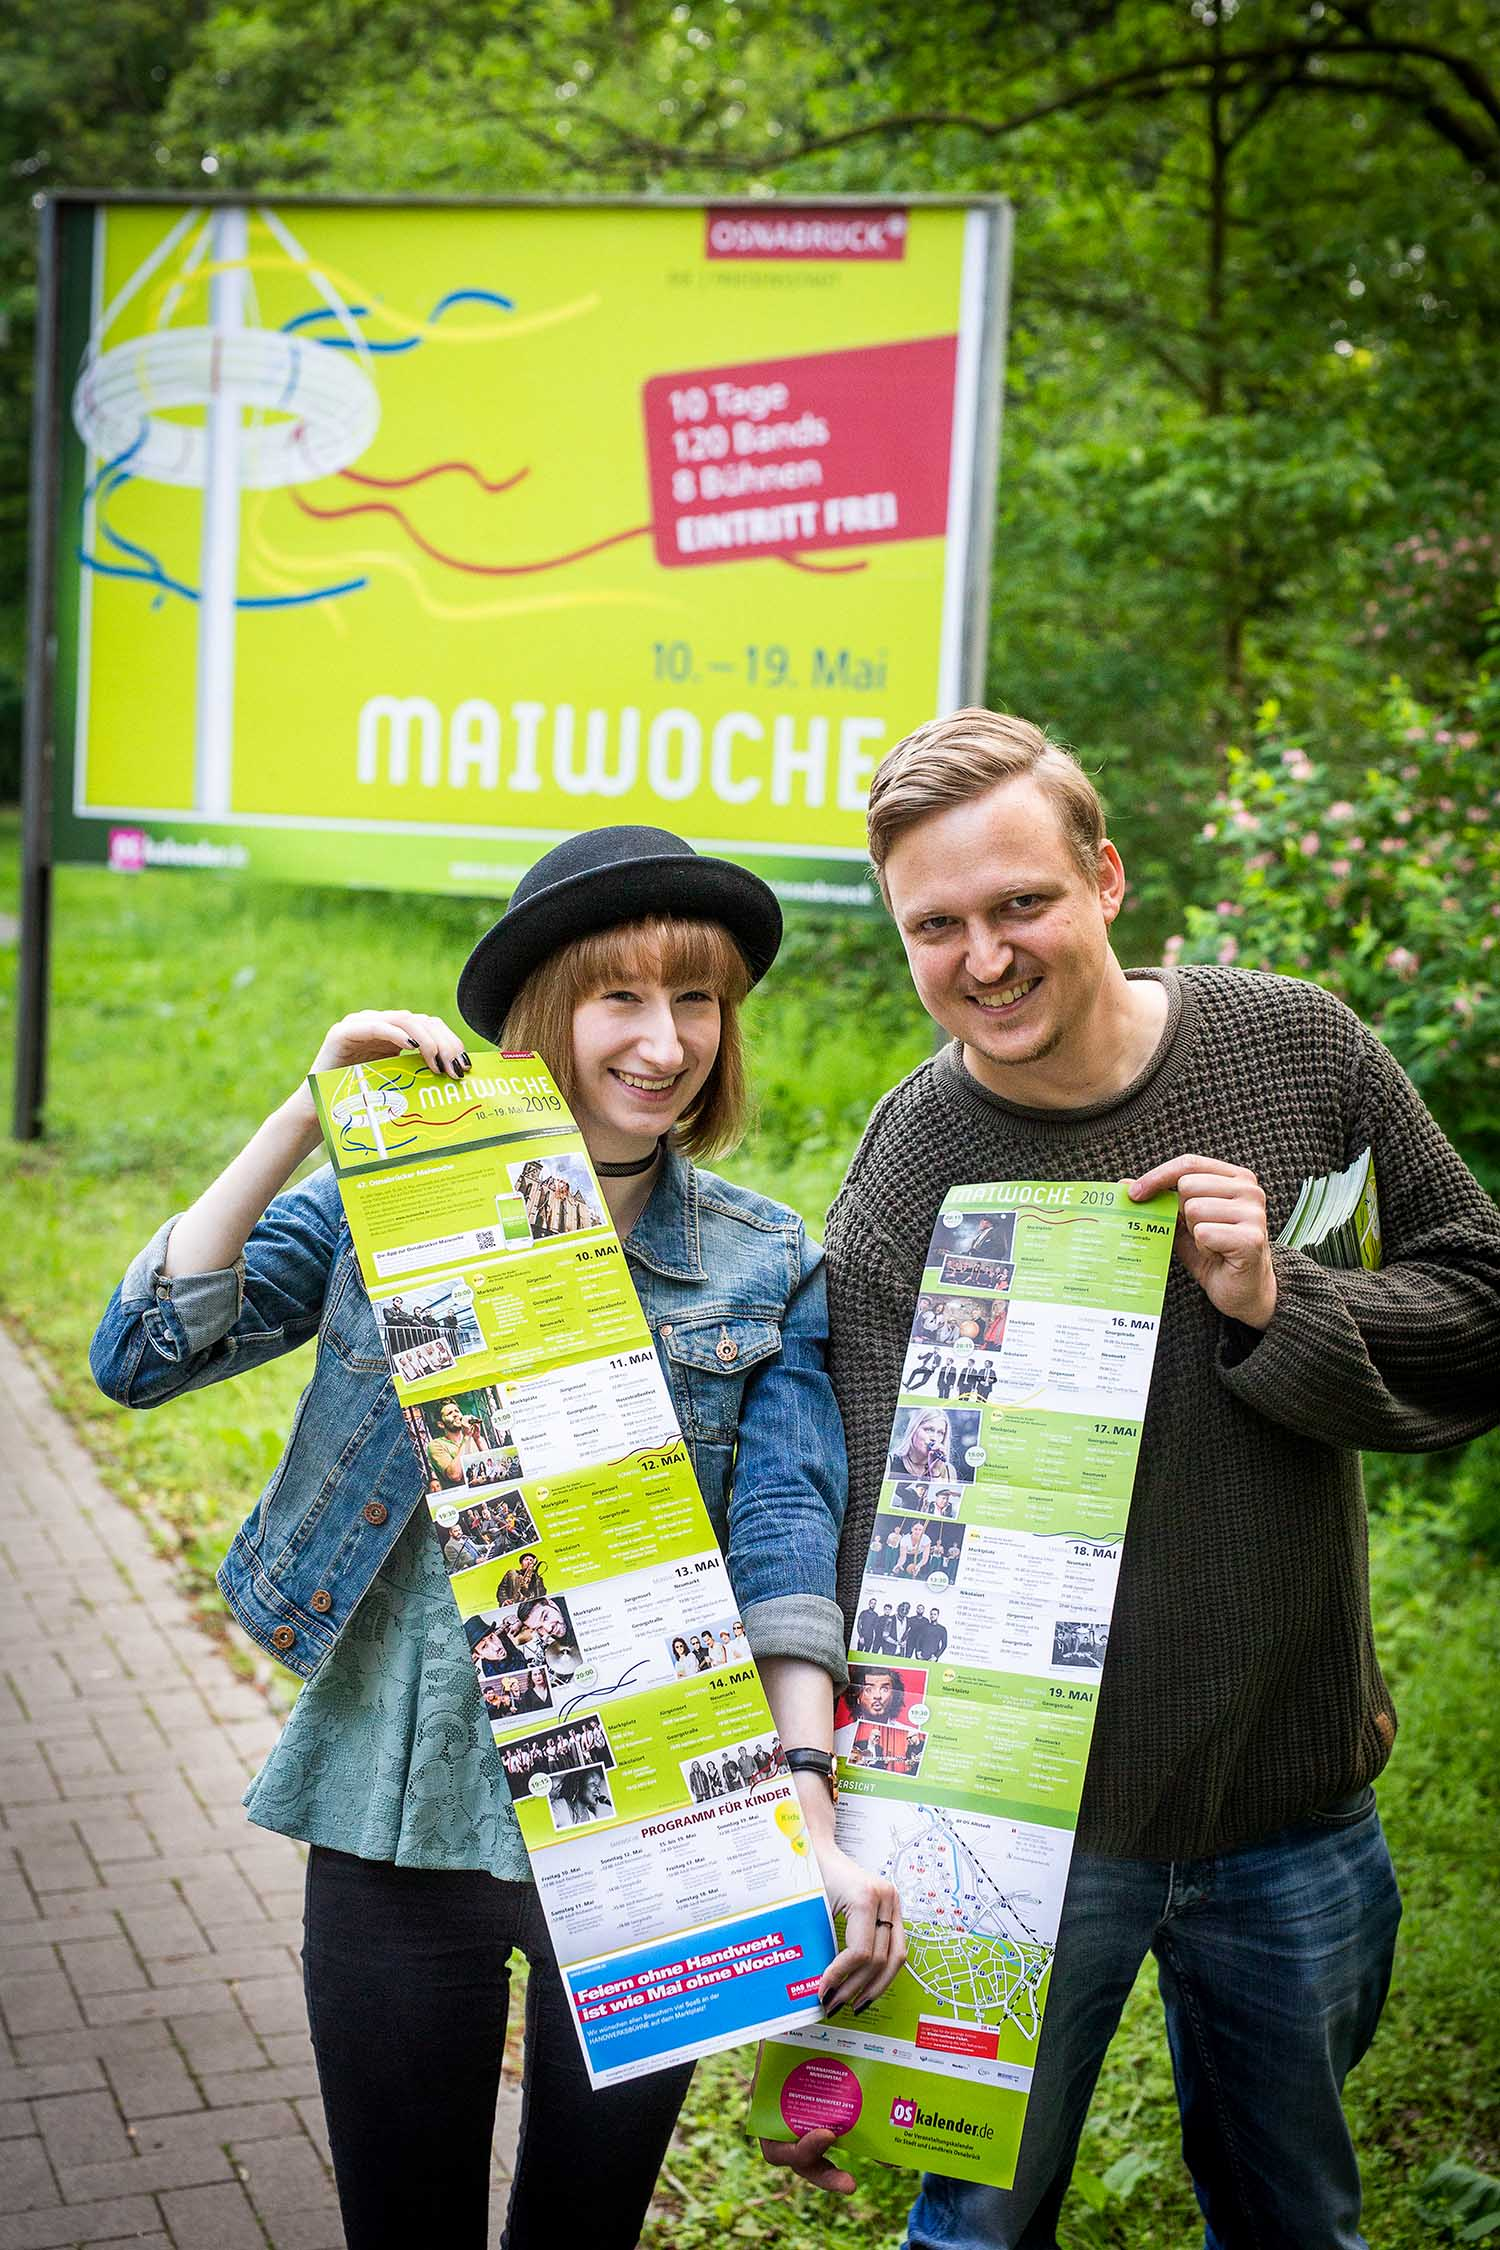 Maiwoche-Flyer Osnabrück 2019: Janina Schlüter und Stephan Gerecht mit dem aktuelle Programmflyer